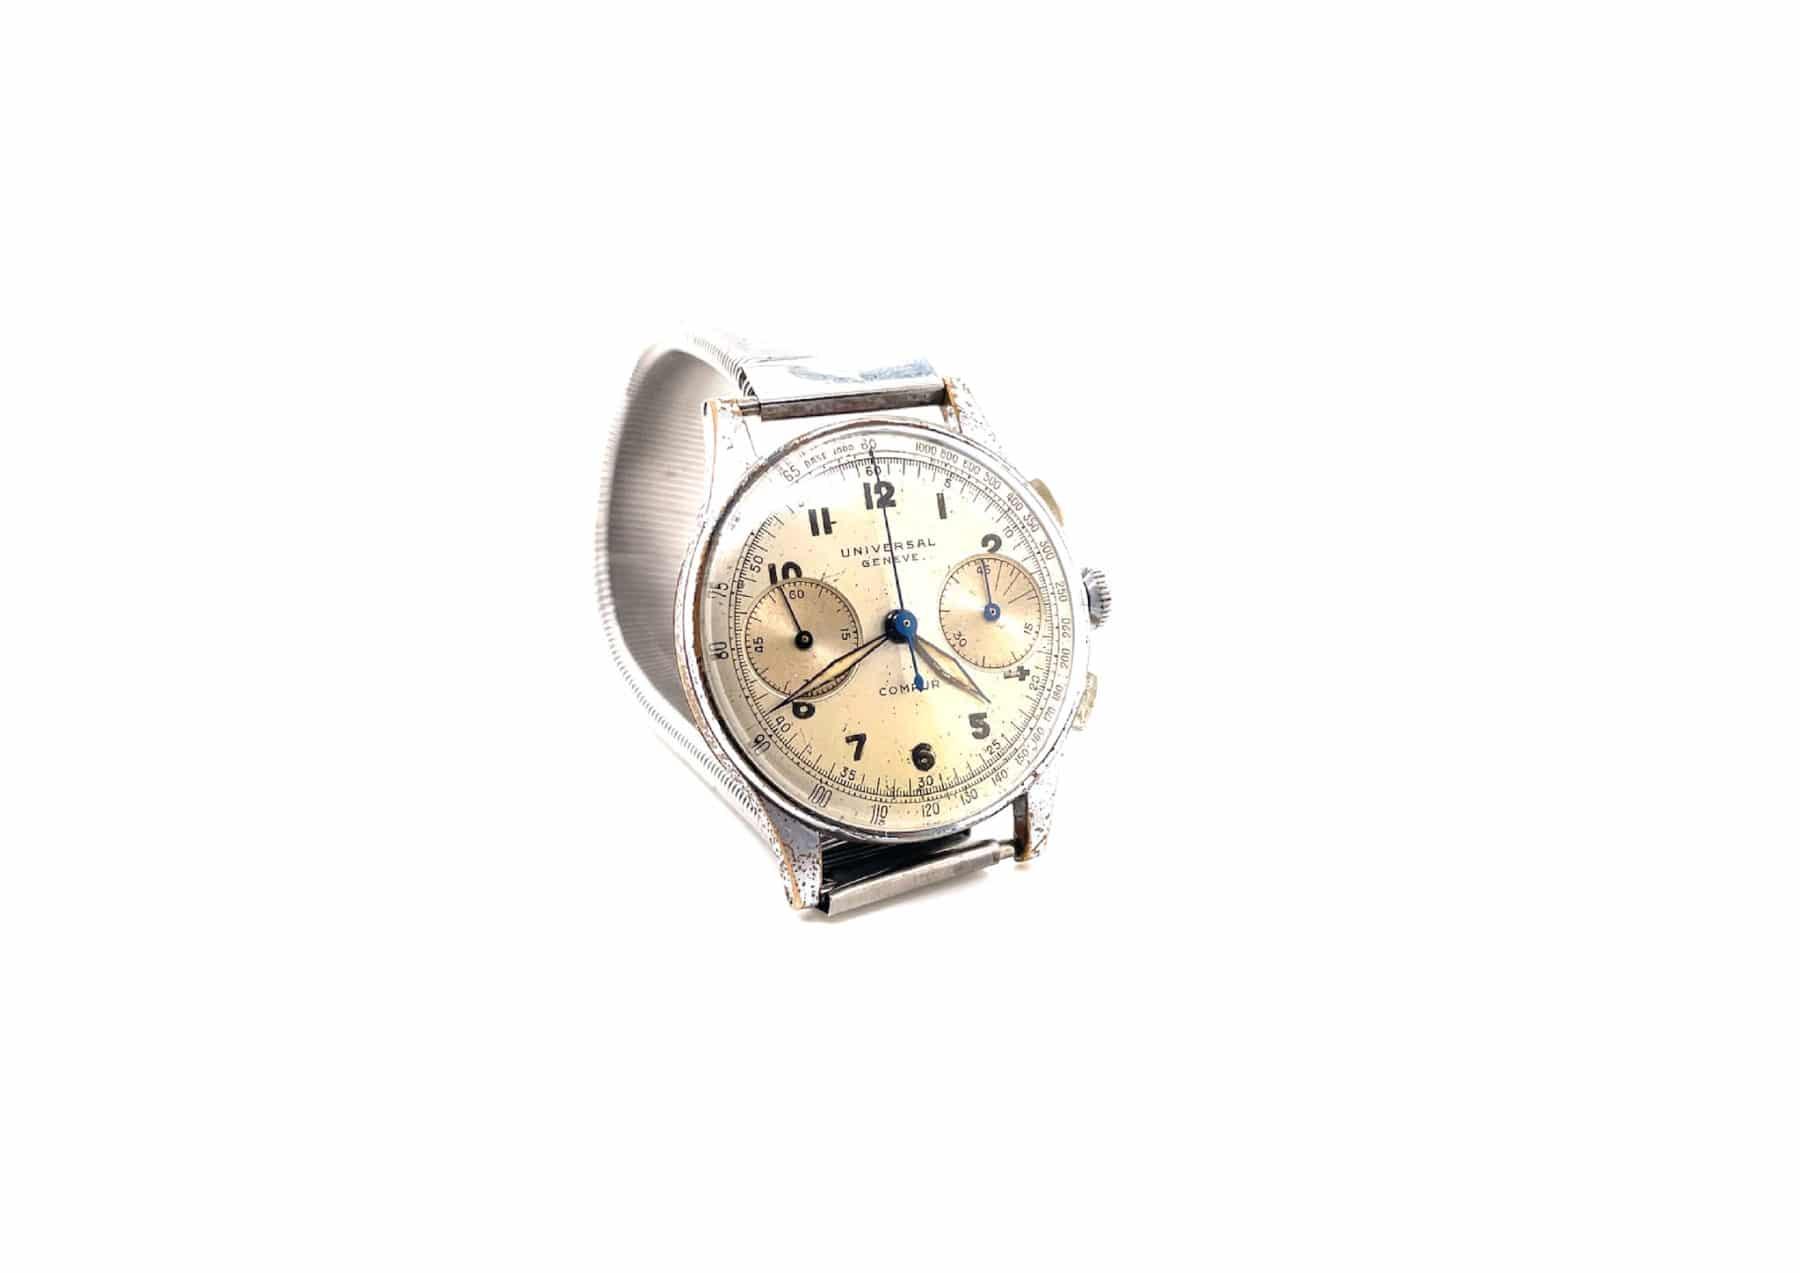 Montre Universal Genève chrono